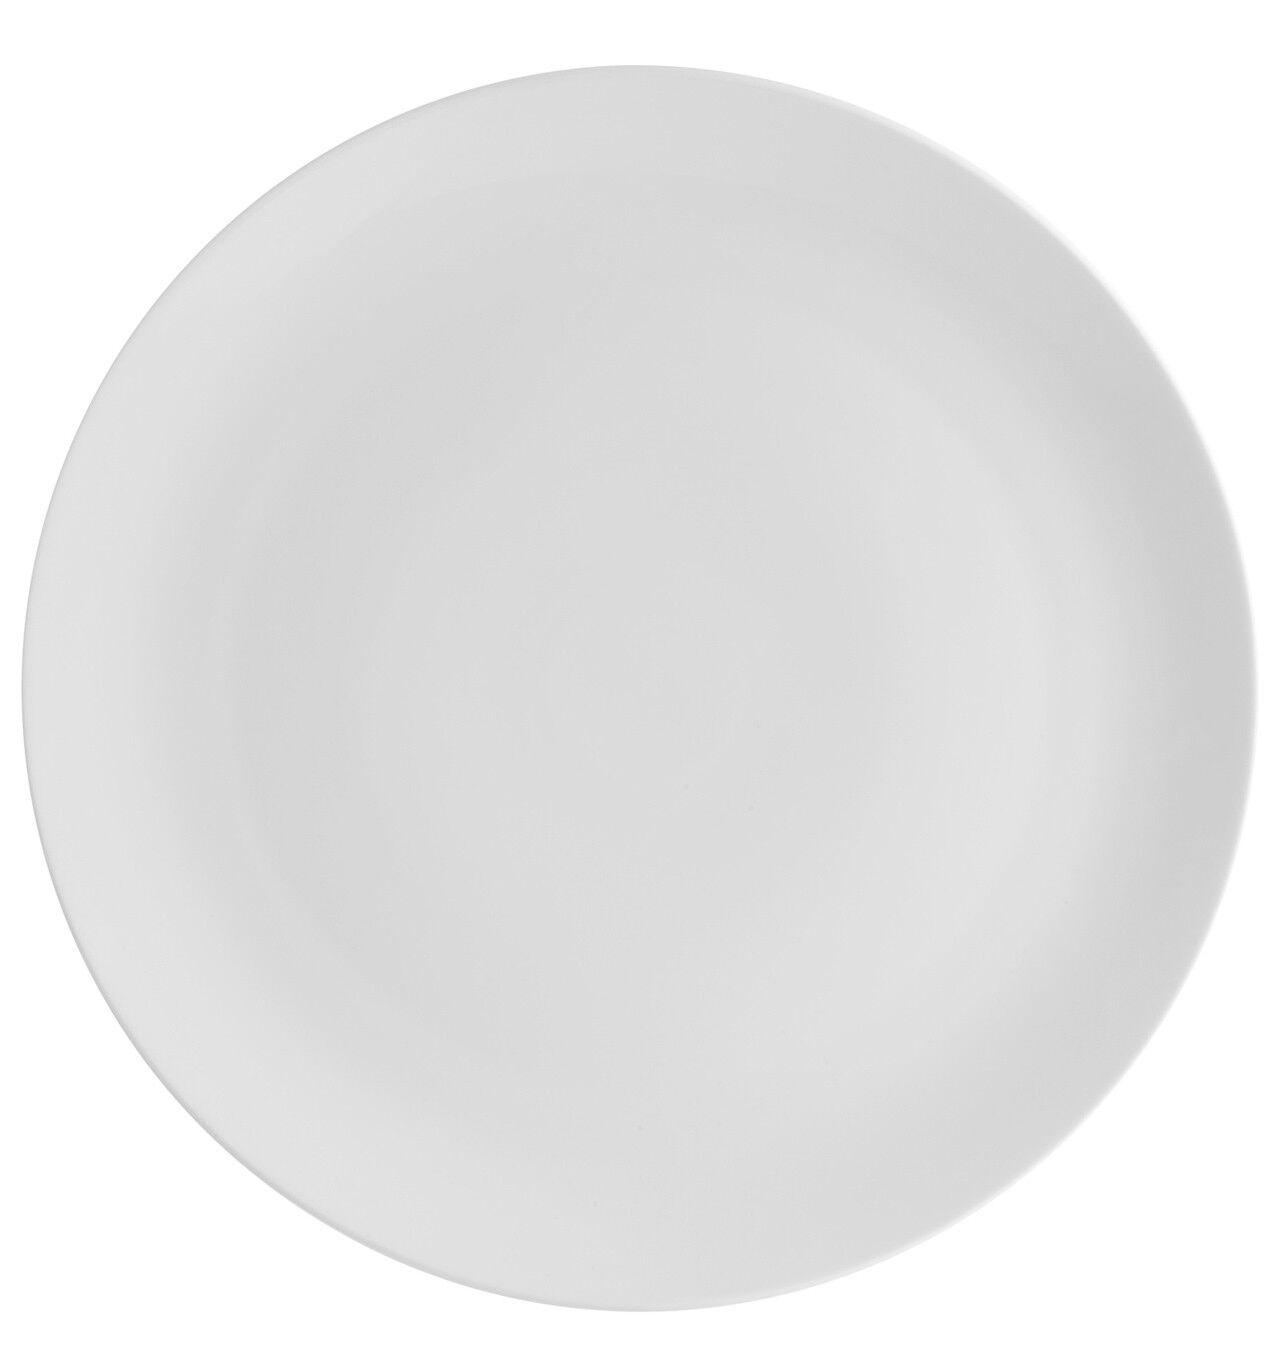 Vista Alegre Broadway blanc Dinner Plate - Set of 12